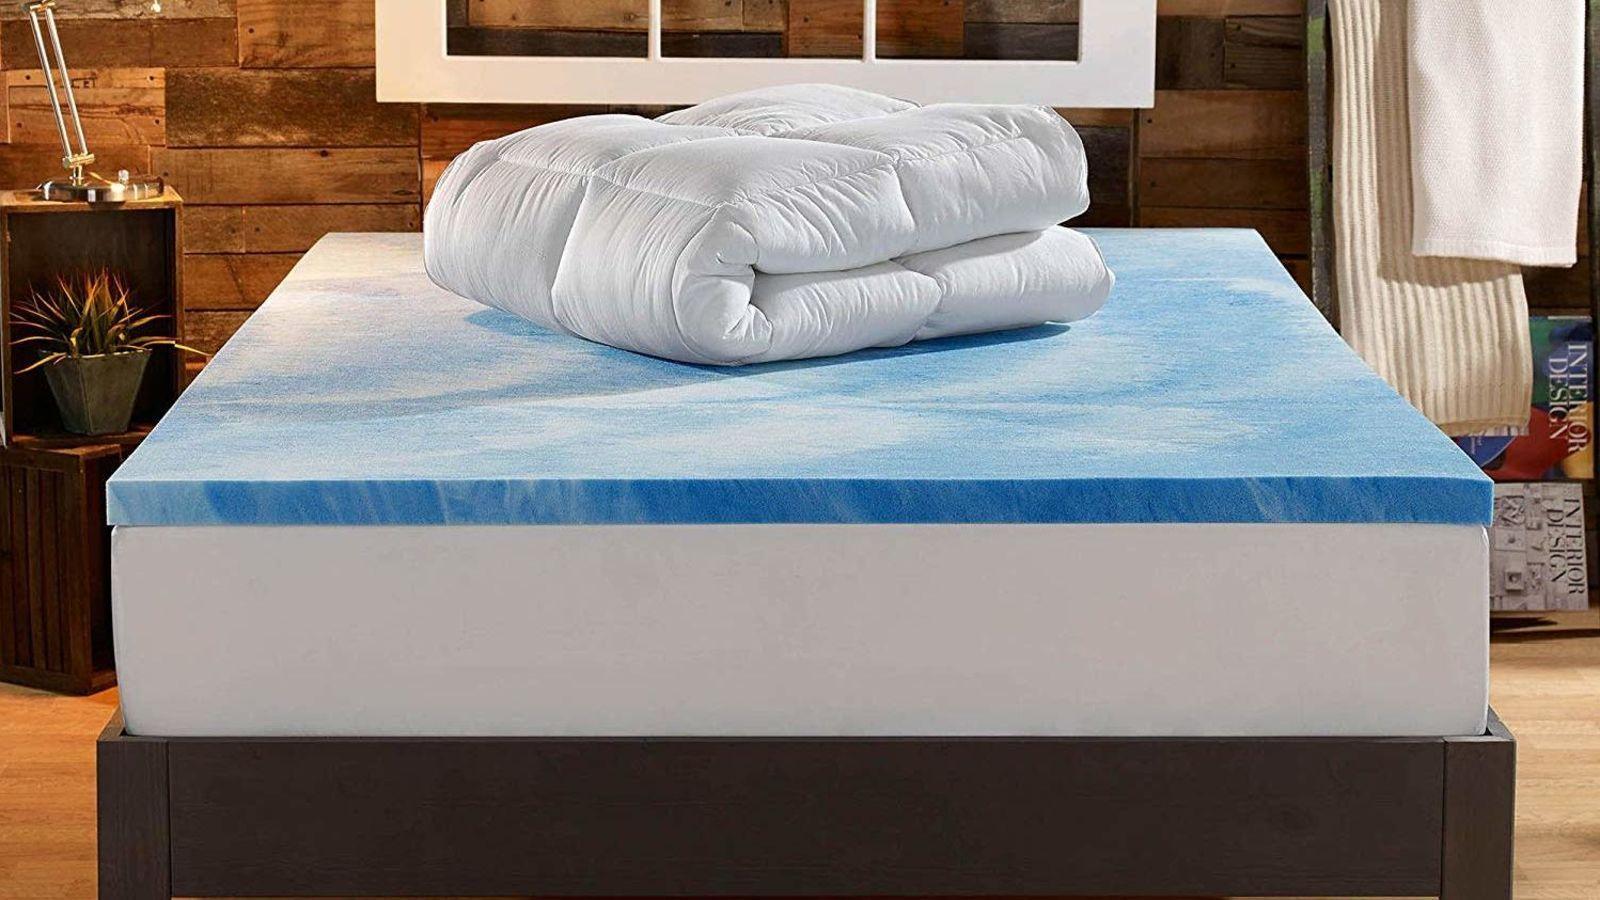 You Ll Sleep Like A Baby When You Buy A Mattress Topper For 20 Off Memory Foam Mattress Topper Mattress Foam Mattress Topper